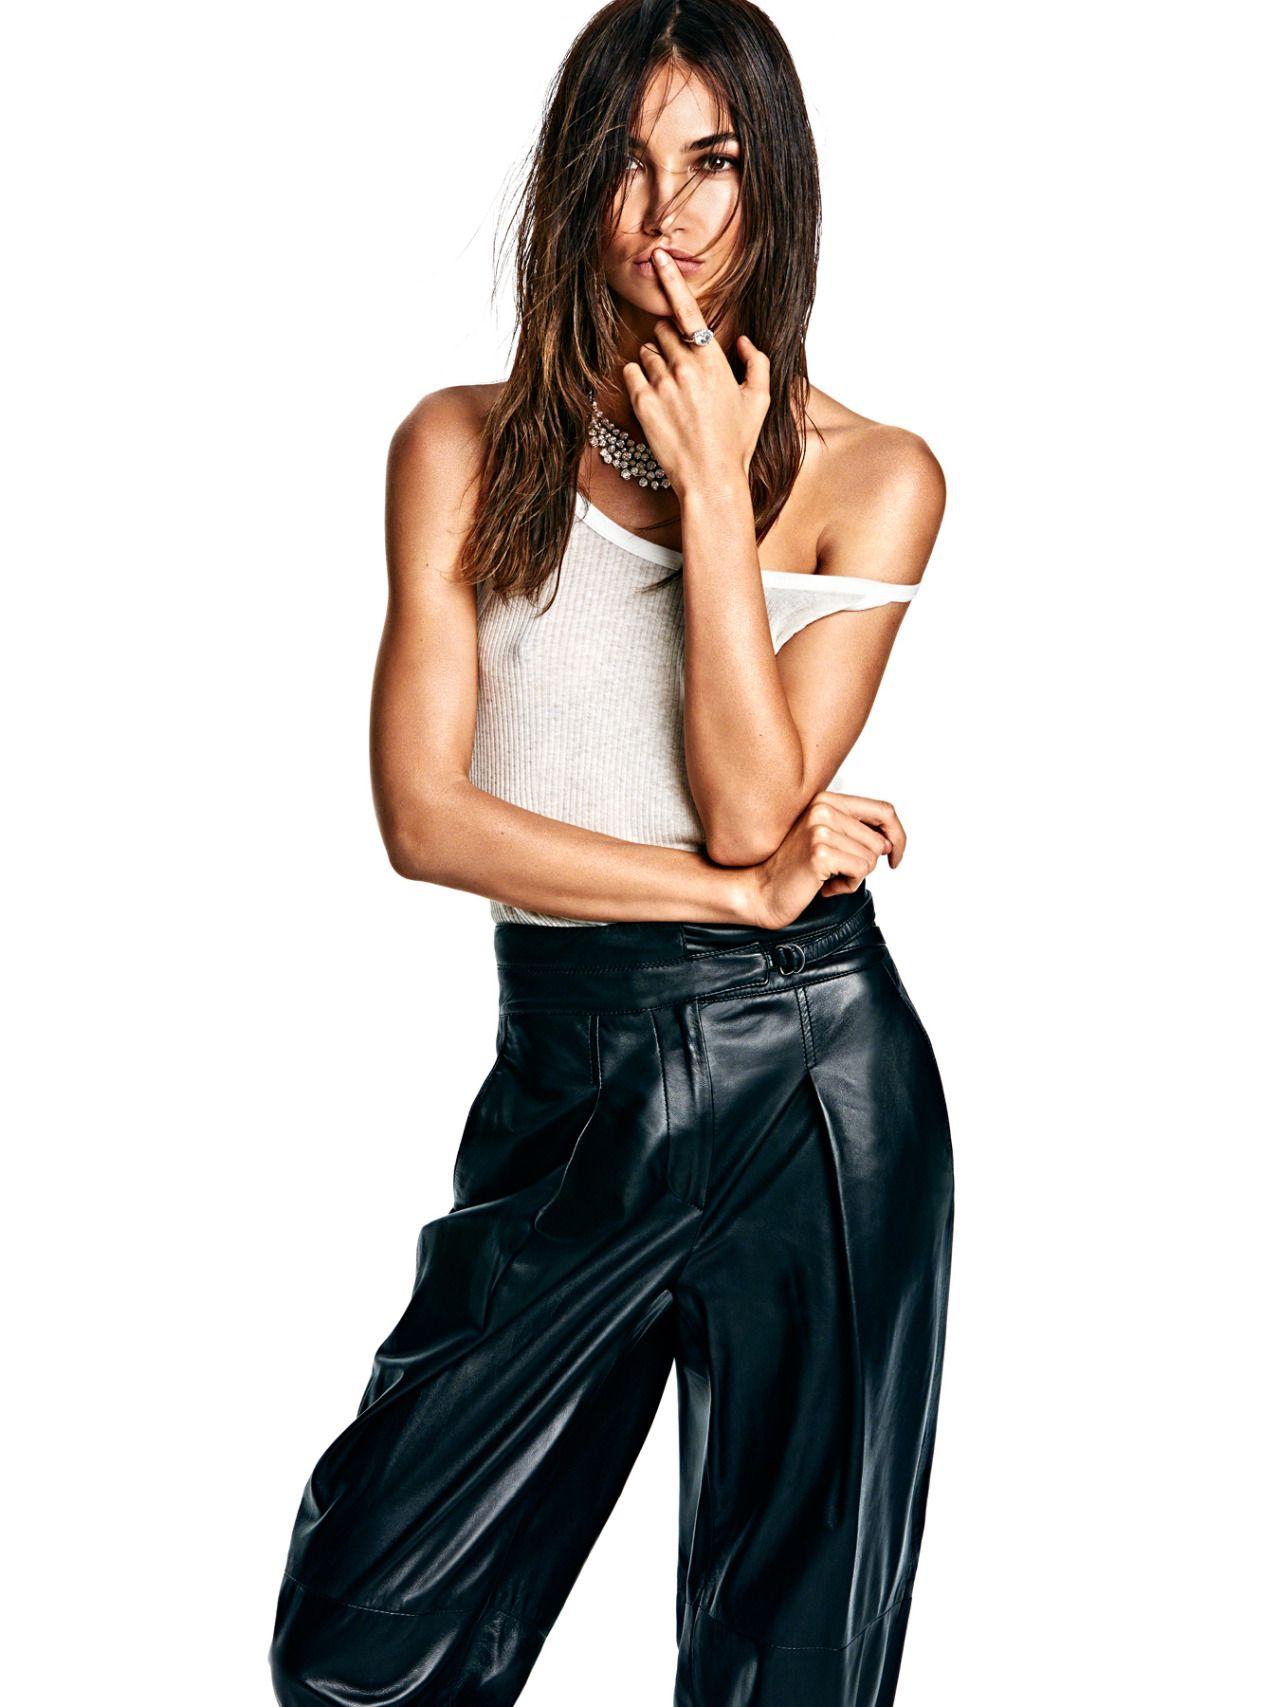 Lily Aldridge for Vogue Mexico - Haider Ackermann leather pants